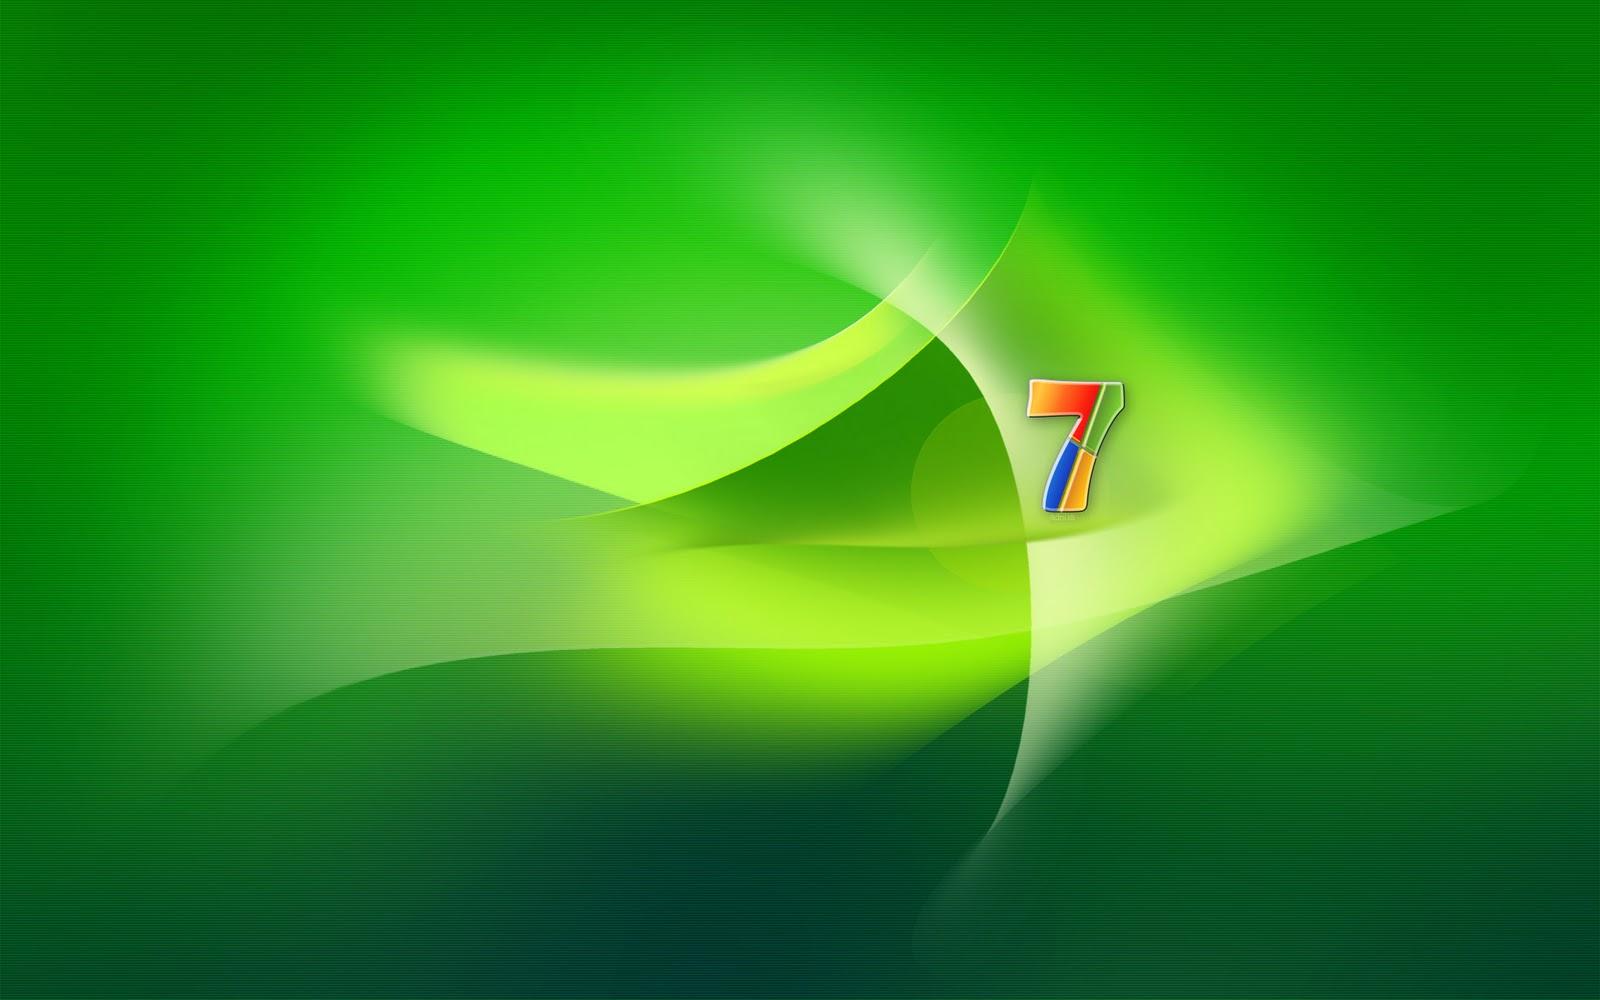 Windows 7 Theme Wallpapers Fresh Green 2012 37647674